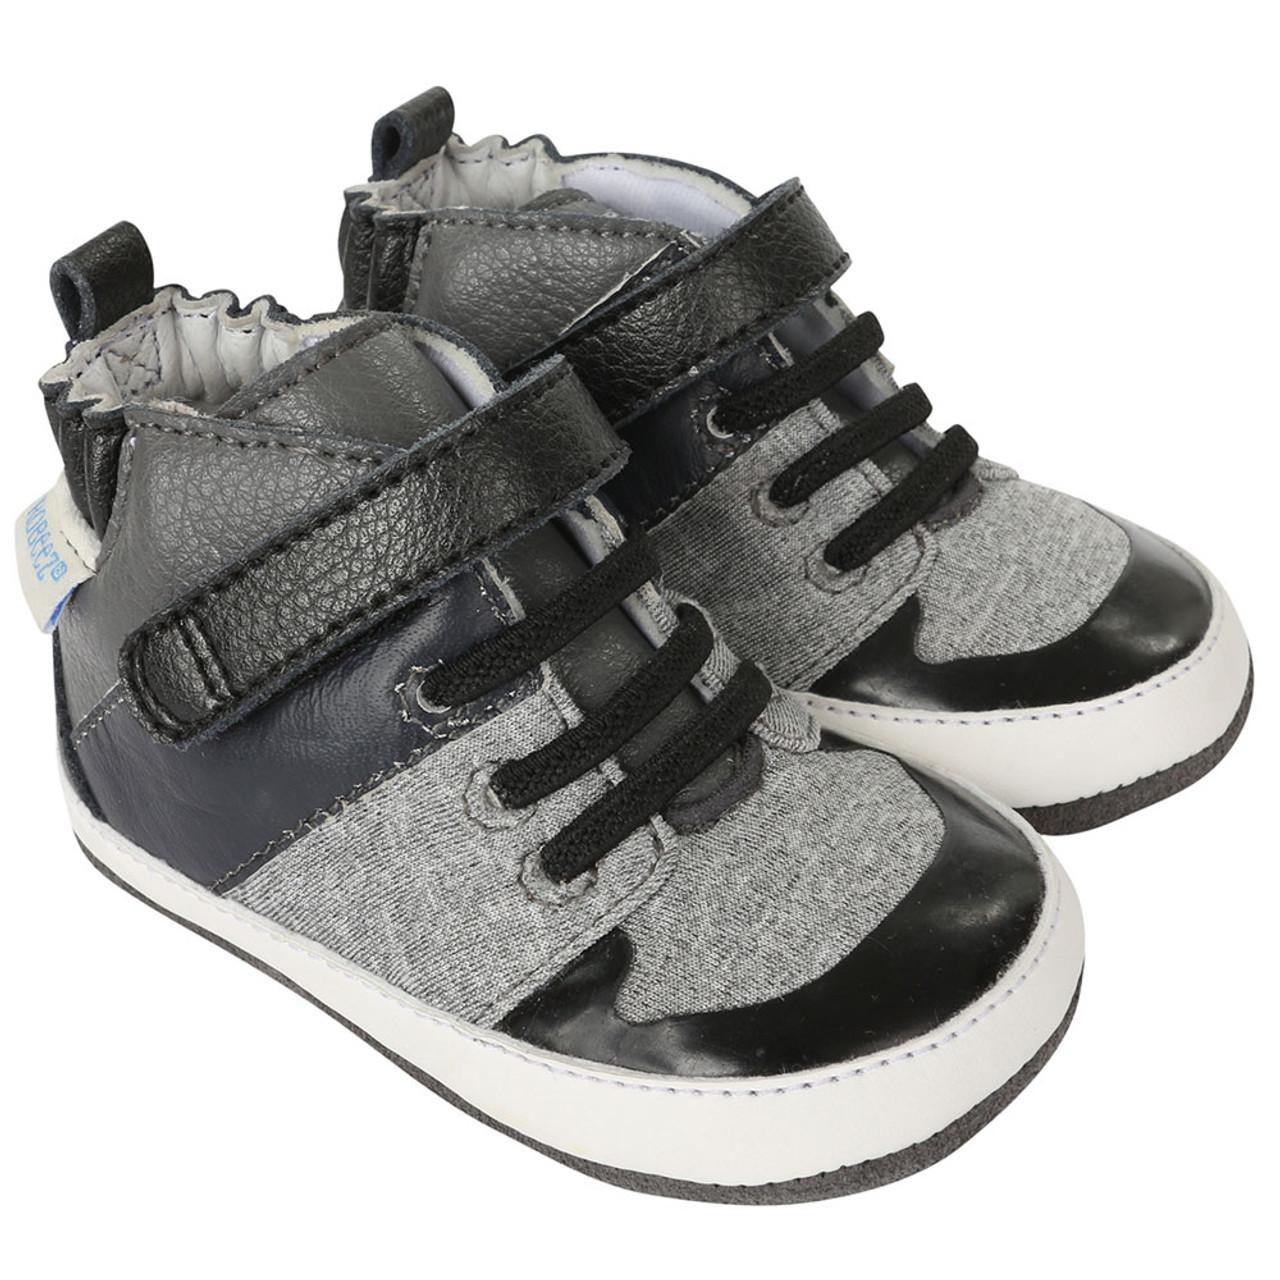 Robeez Kids Sneaker-Mini Shoez Crib Shoe